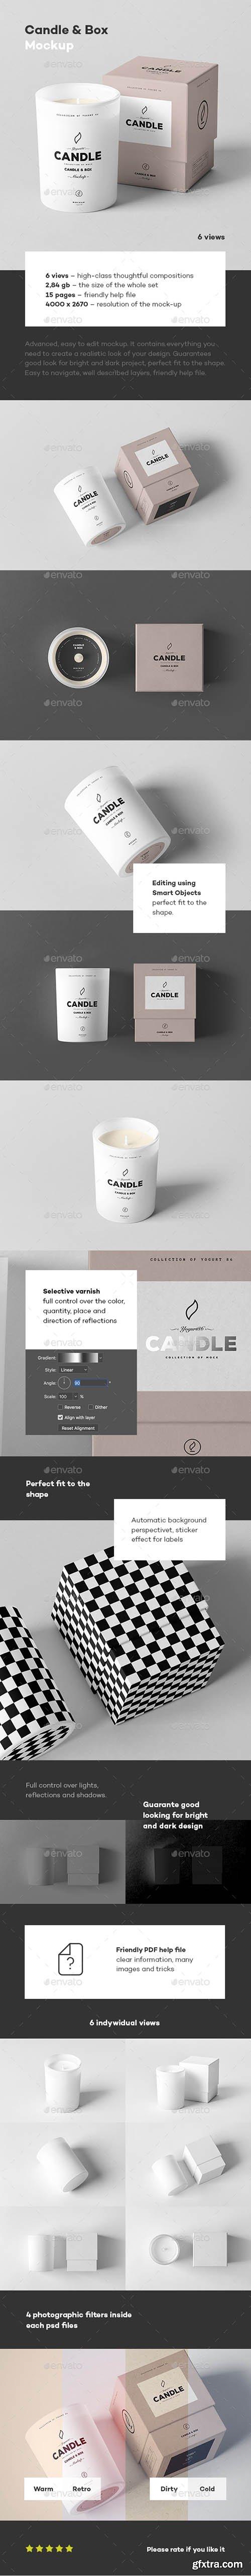 Candle & Box Mock-up 22011958